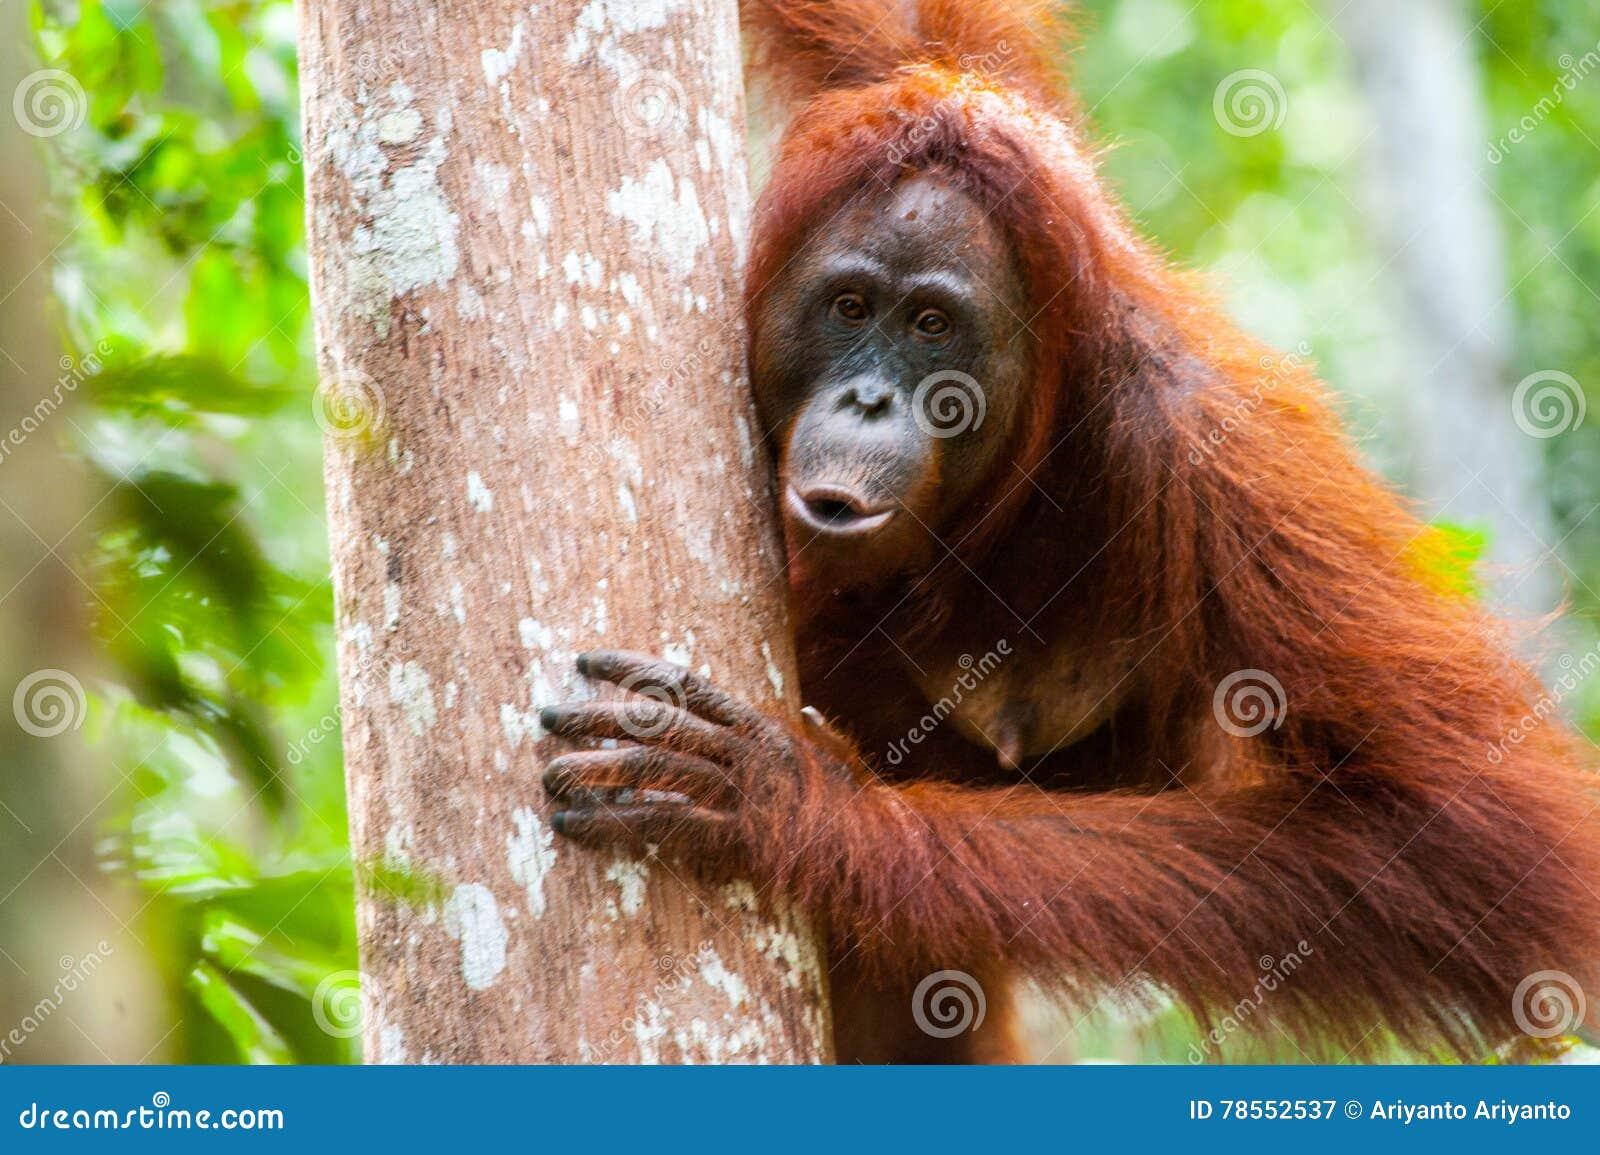 Orangutan kalimantan tanjung puting national park indonesia